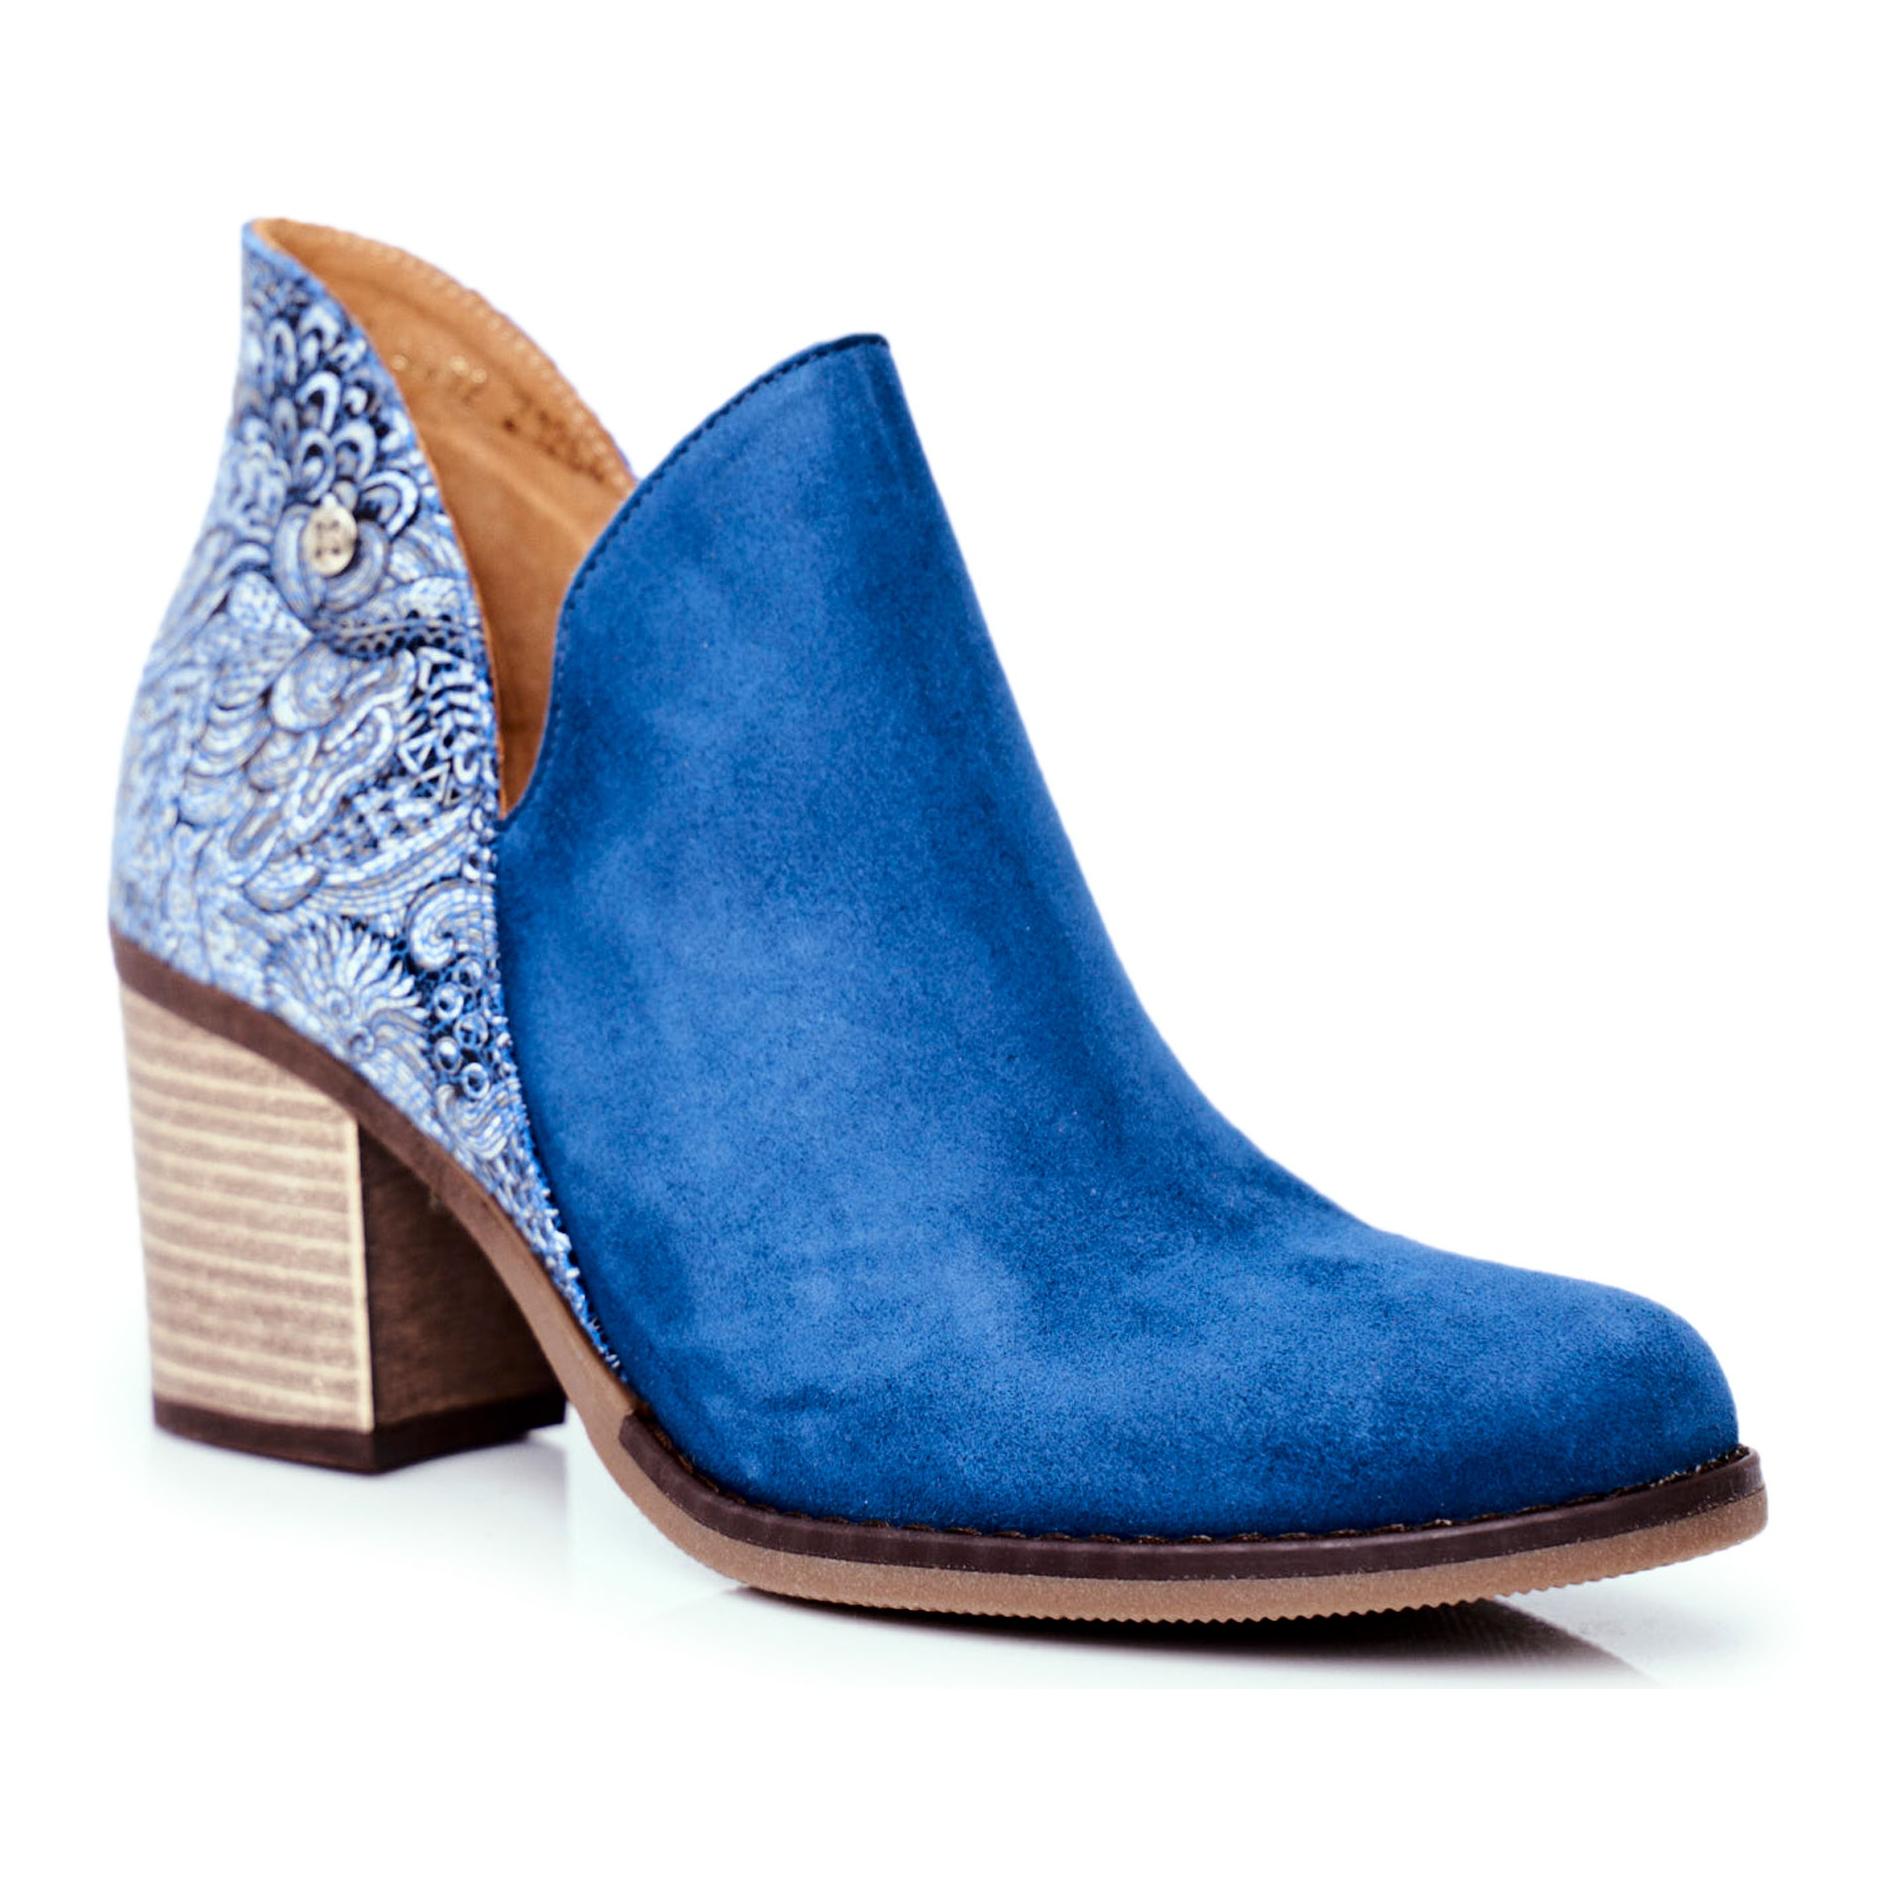 Maciejka Women's Ankle Boots Spring